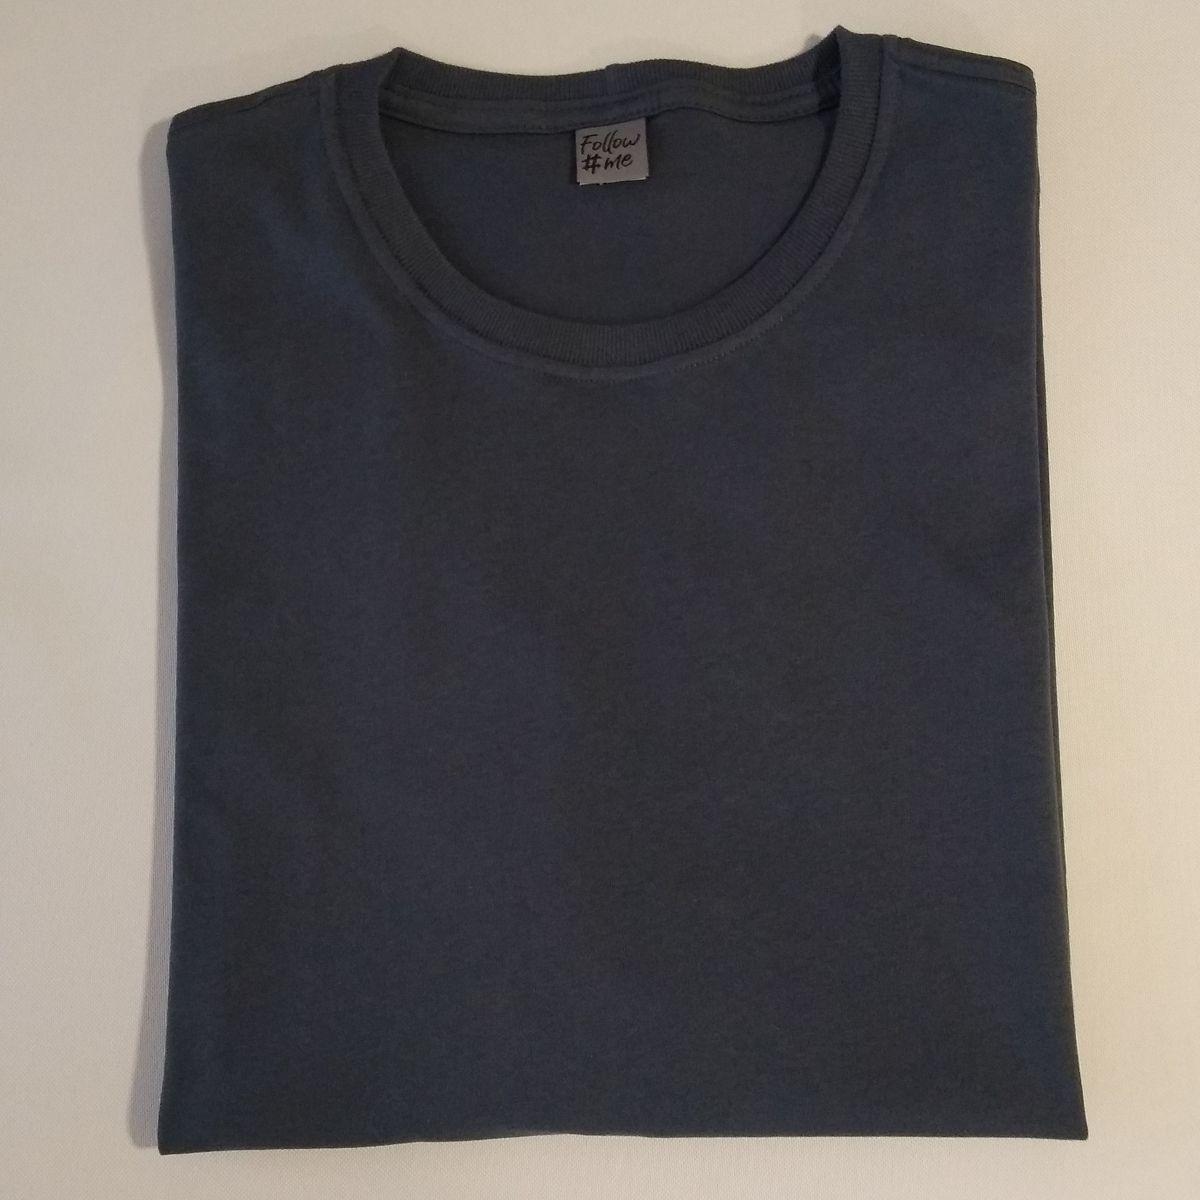 Camiseta Masculina Plus Size Algodao Penteado Luxo G5 G6 G7